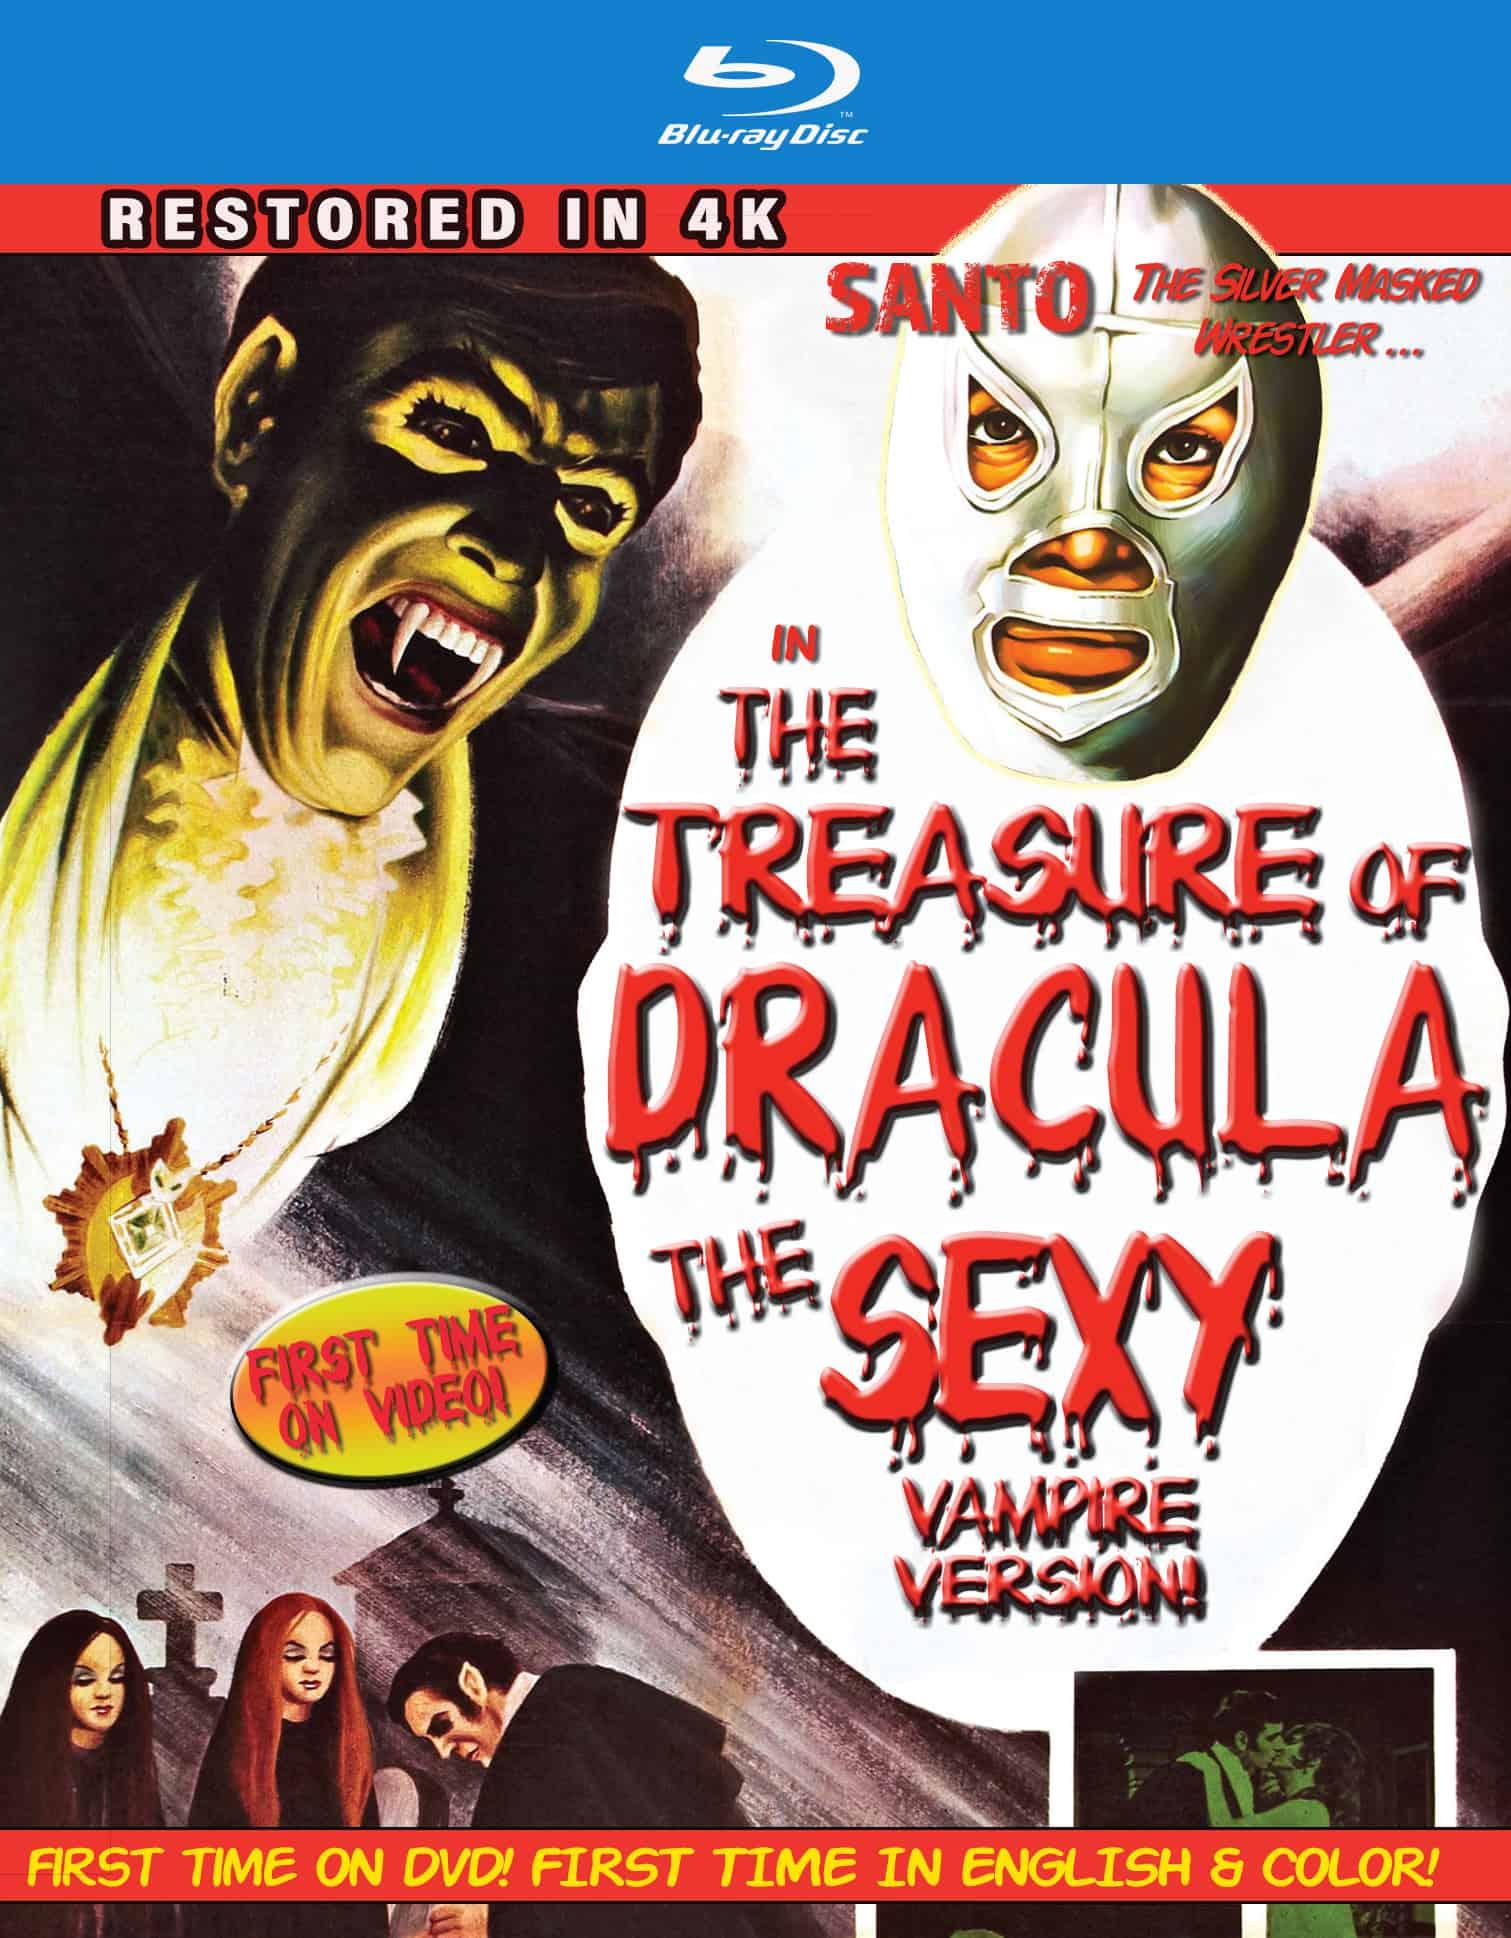 treasure of dracula sexy february 2021 blu-ray